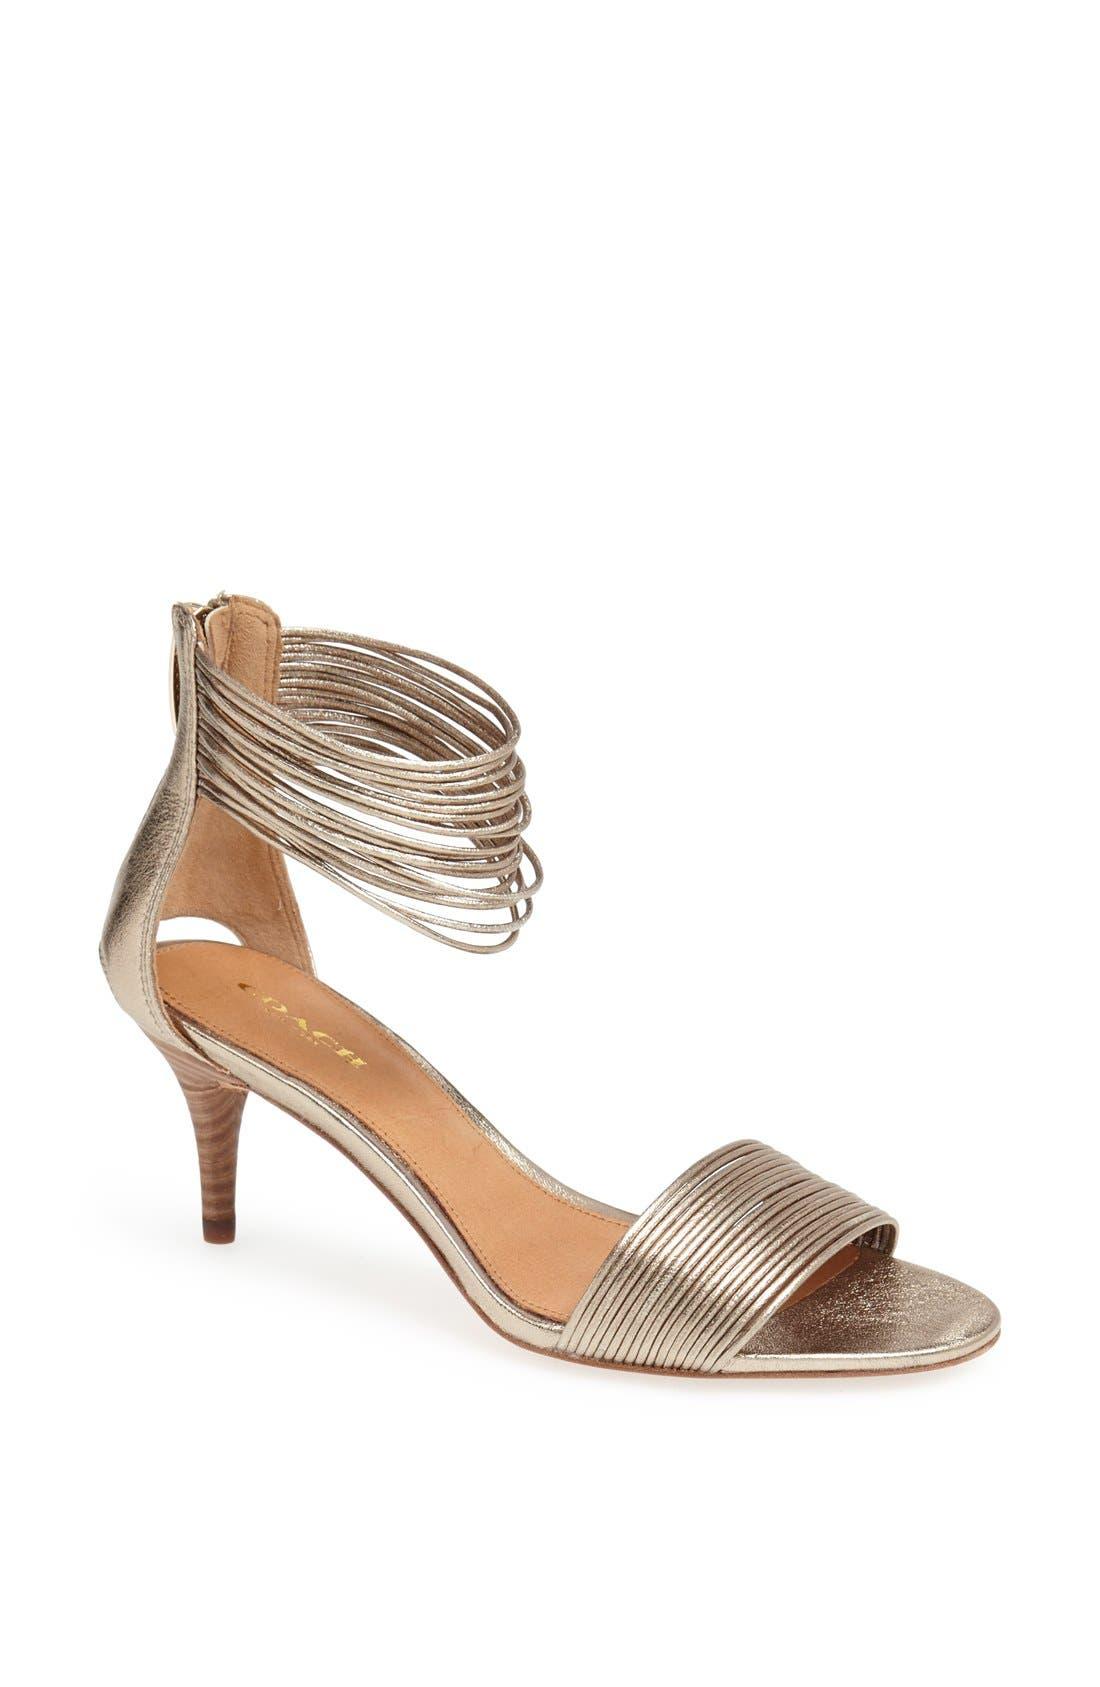 Alternate Image 1 Selected - COACH 'Manya' Sandal